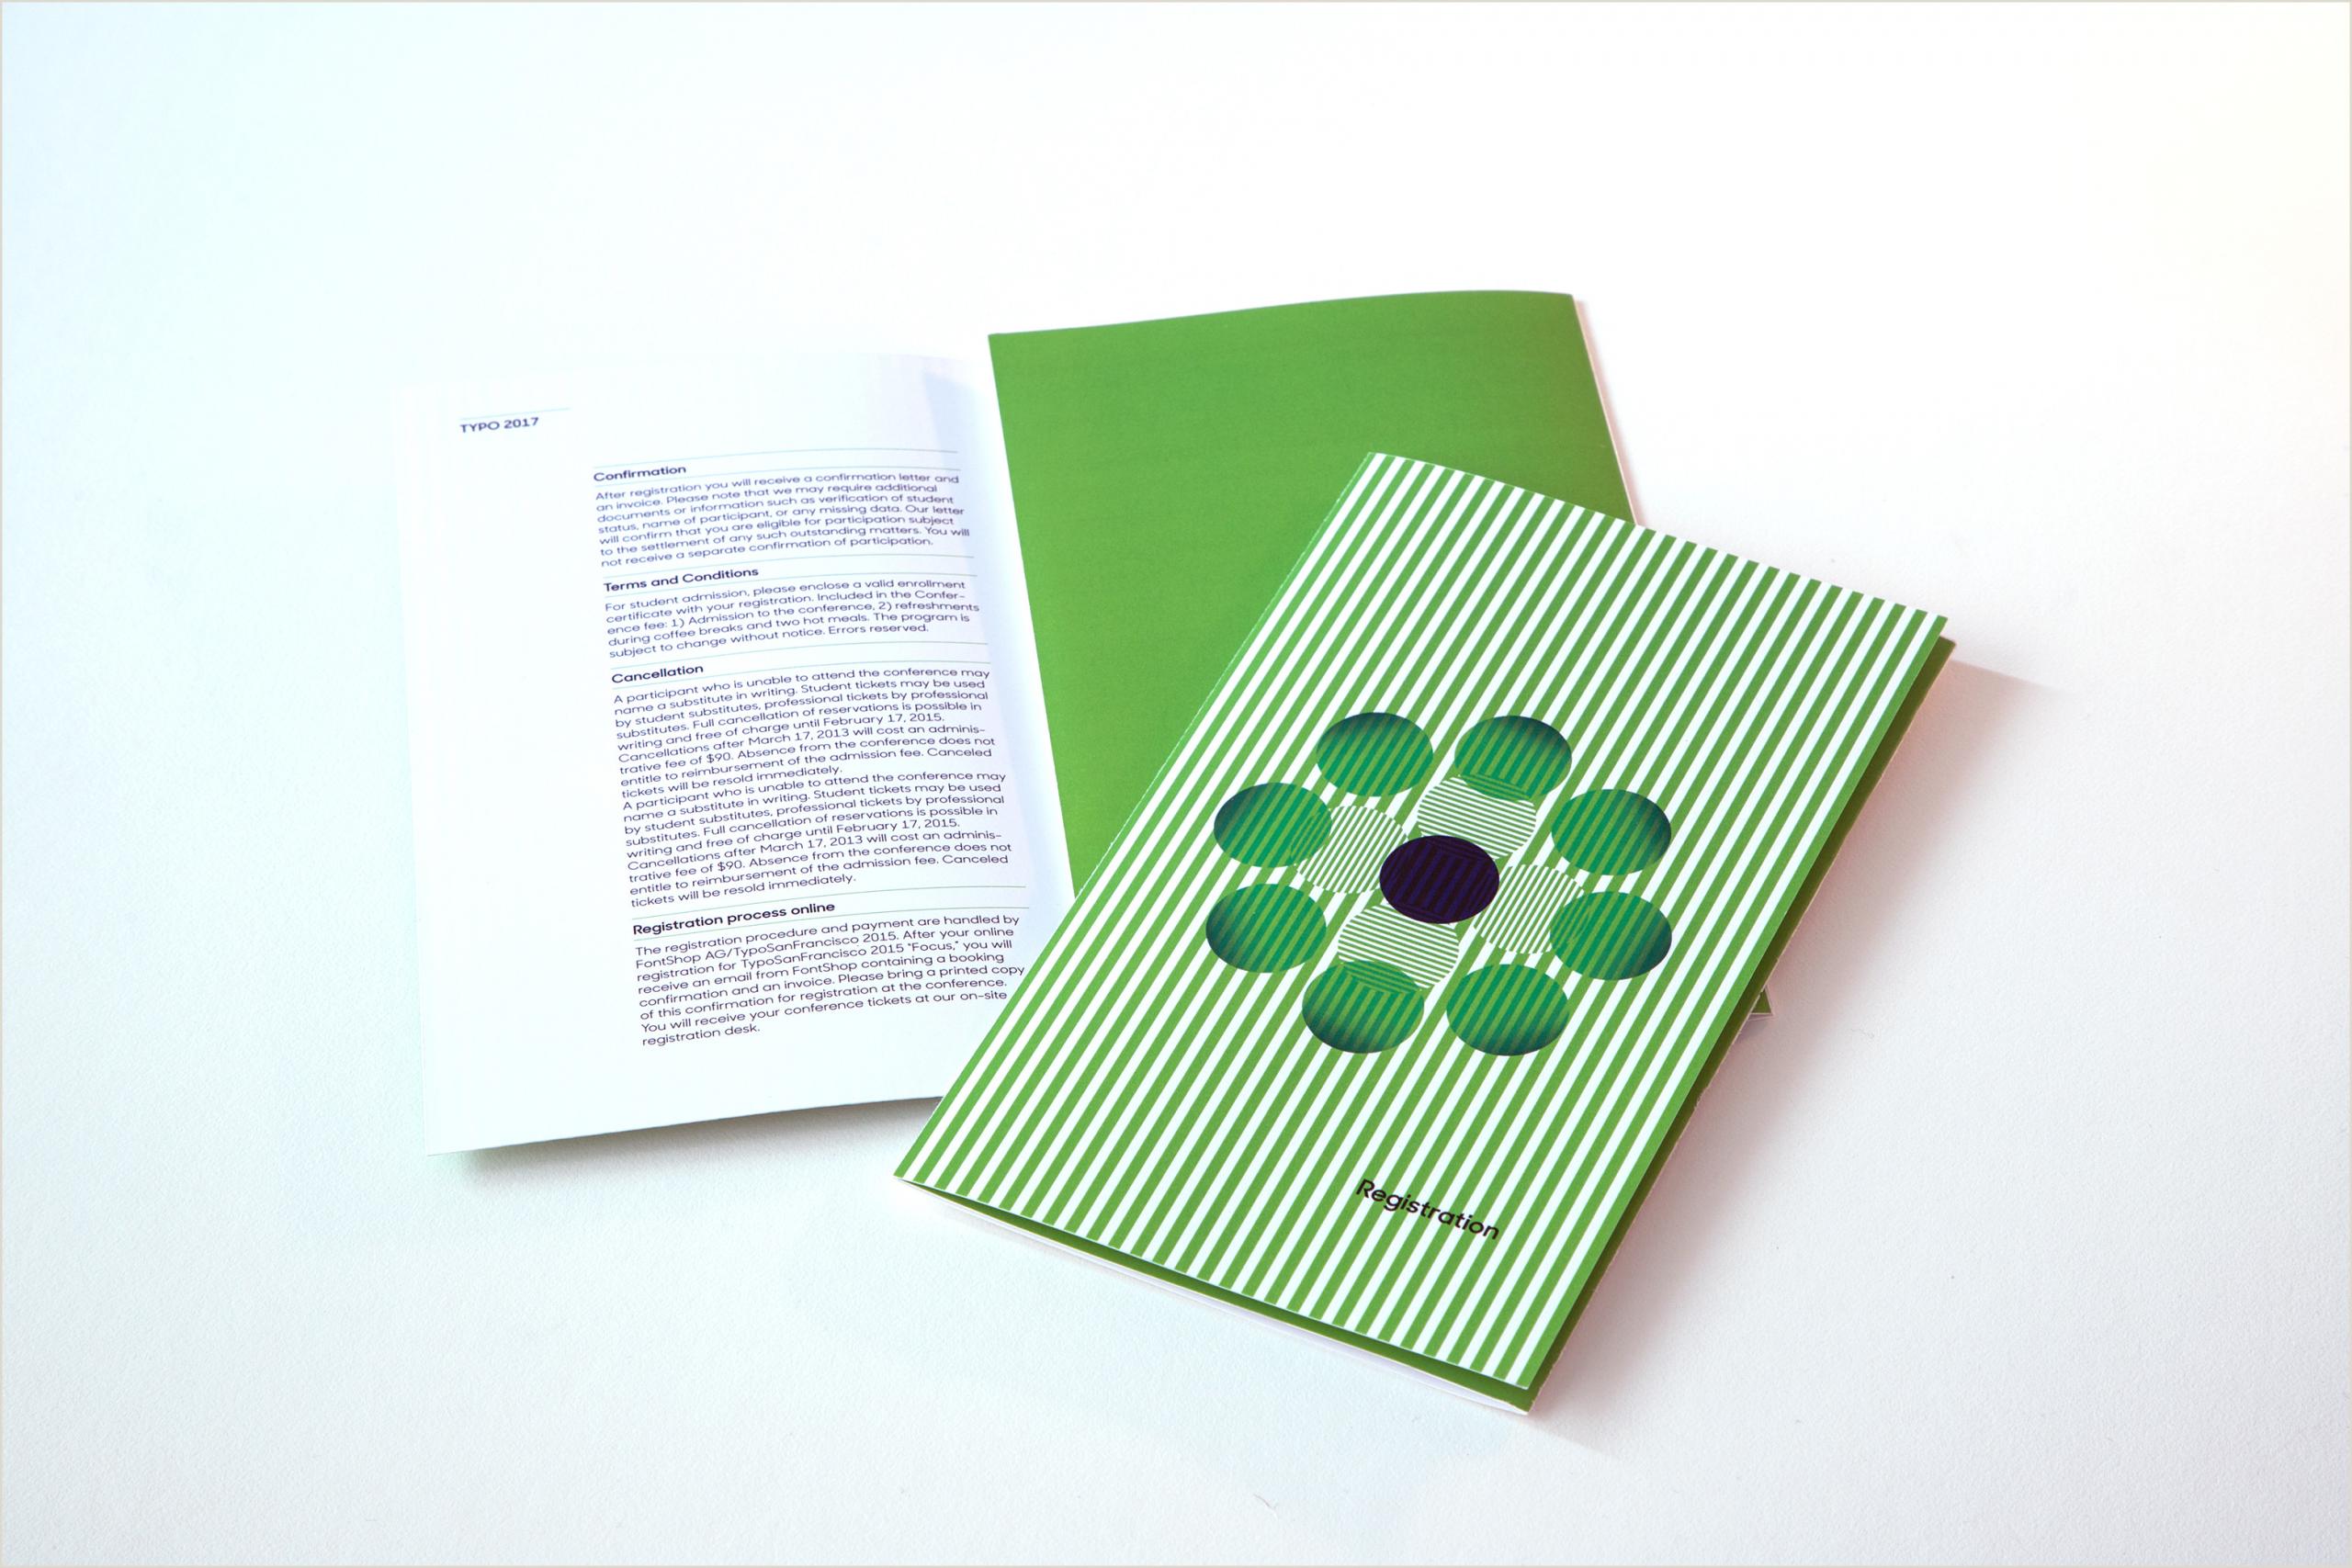 Card Layout Ideas Kursus Pemrograman Web Di Jogja Murah Terbaik Biaya Kursus